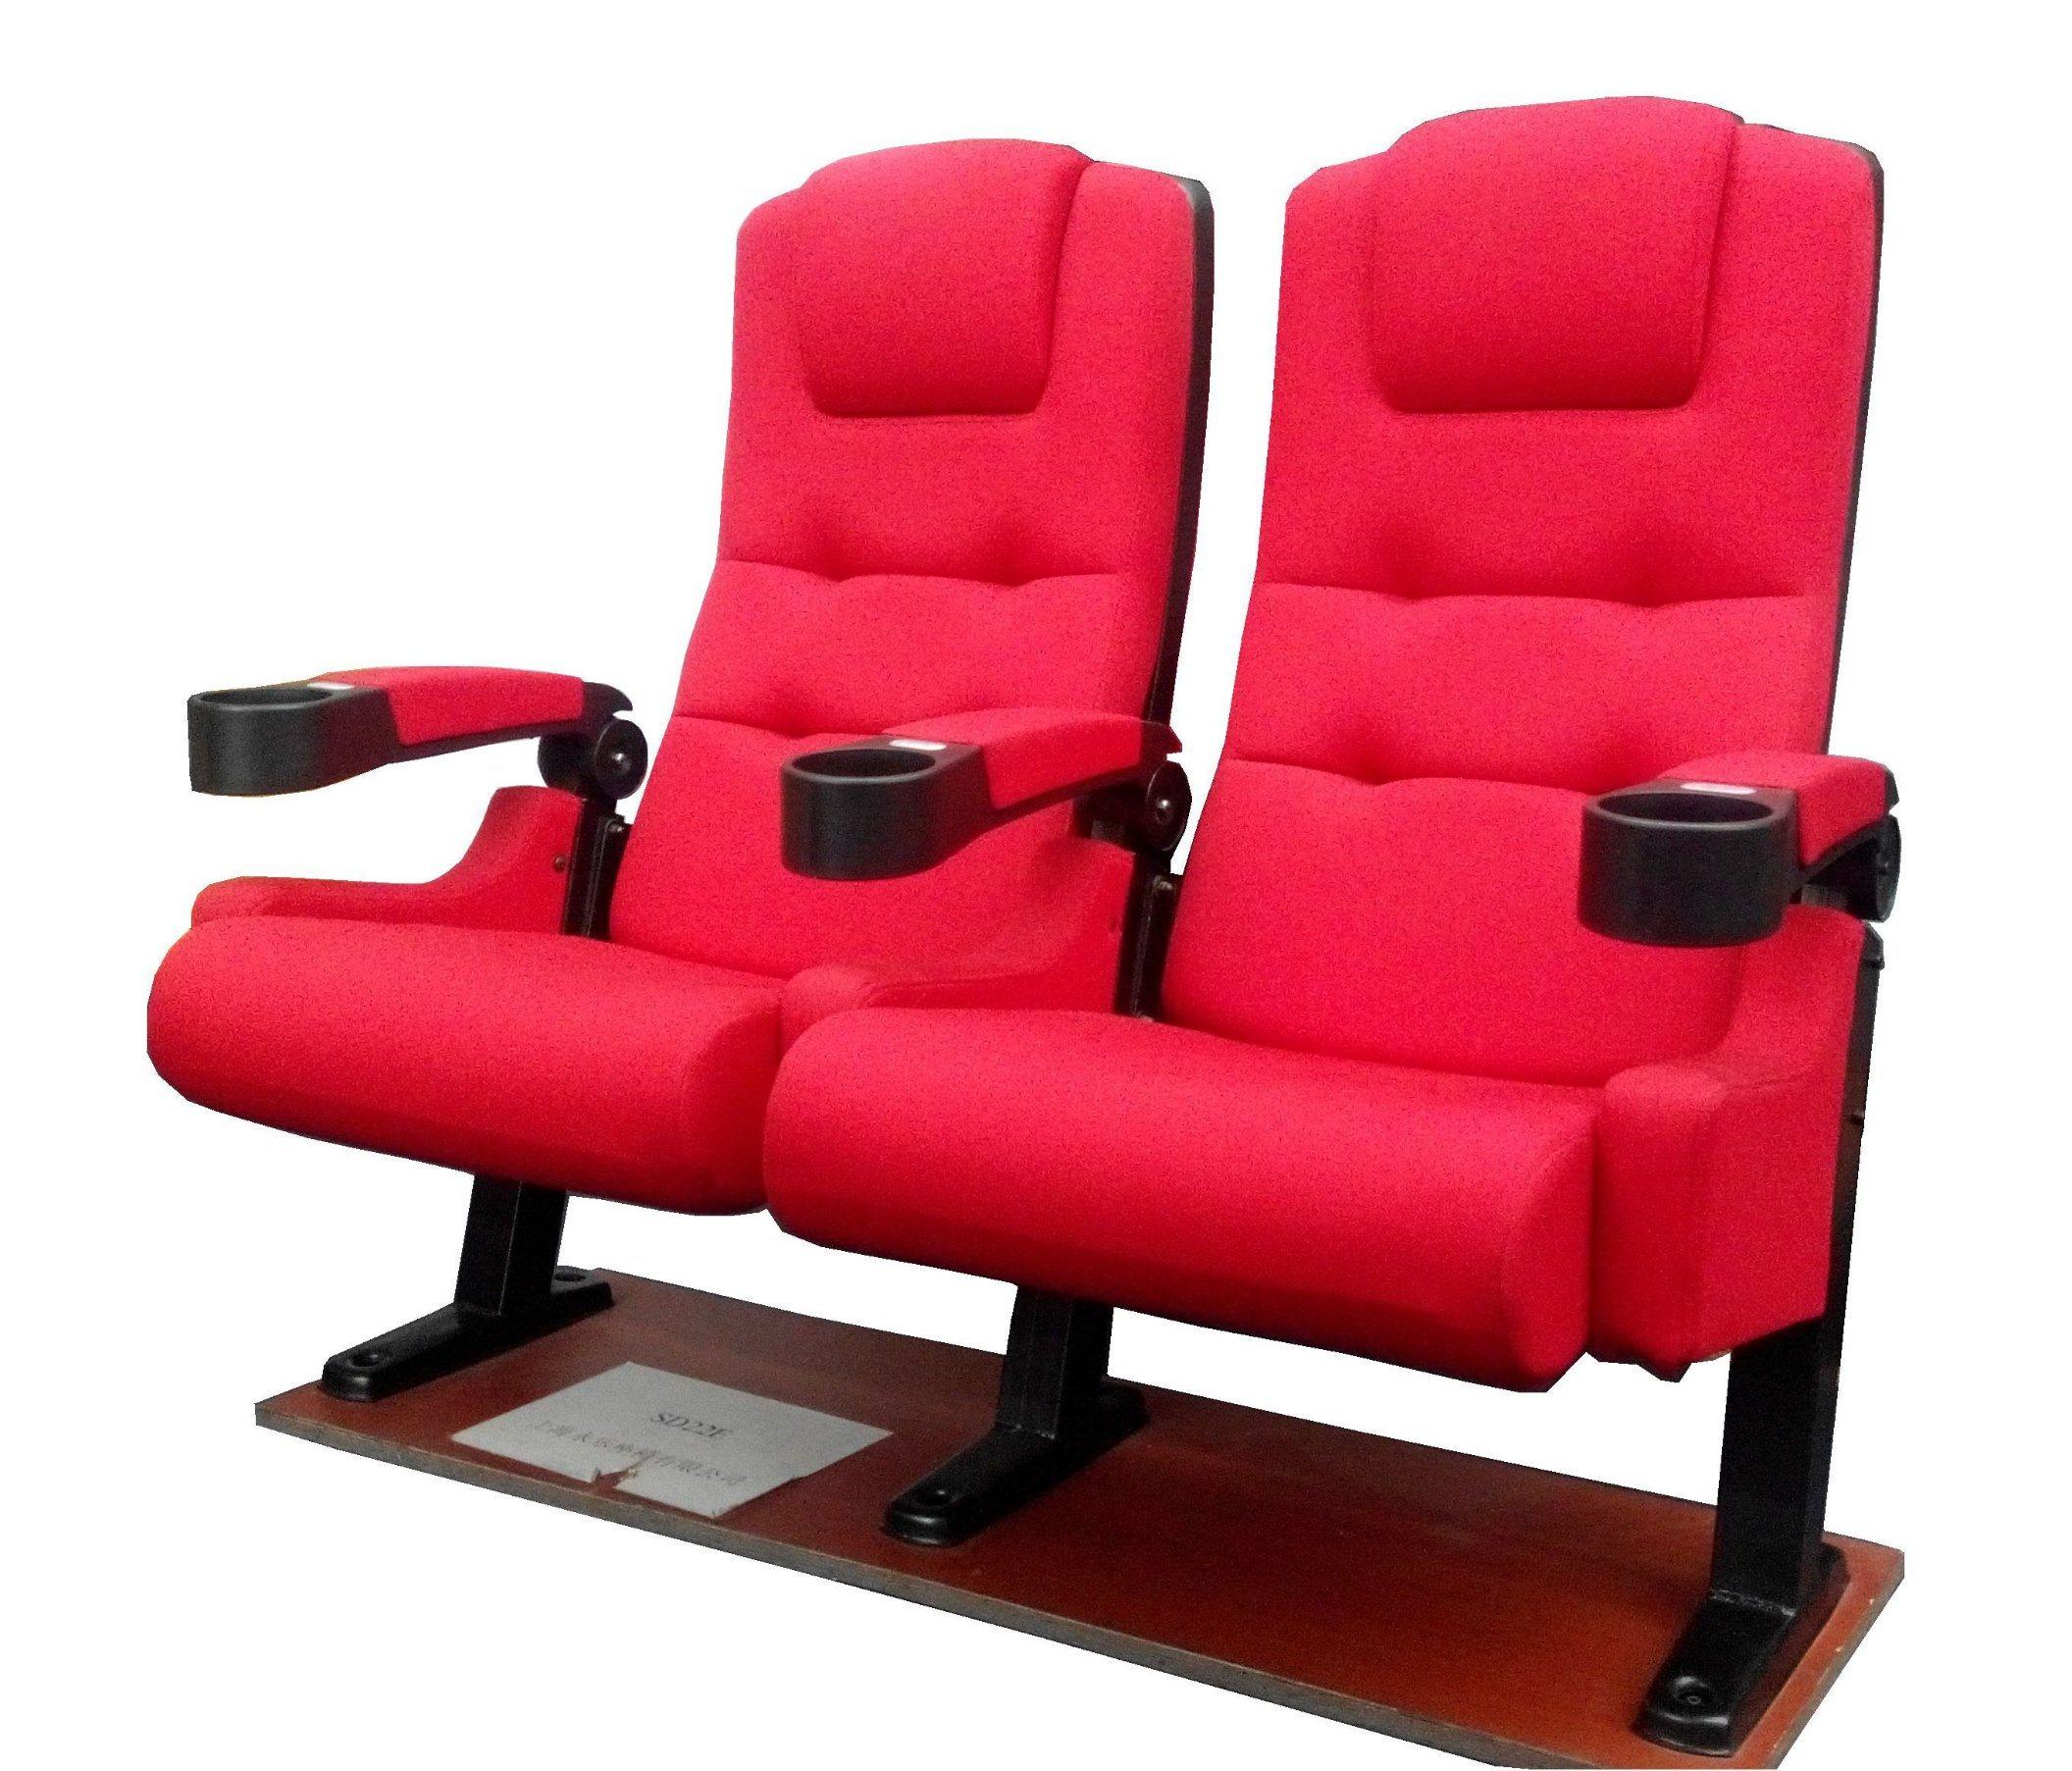 Cinema Seating/Theater Seating/Auditorium Seating (SD22E)